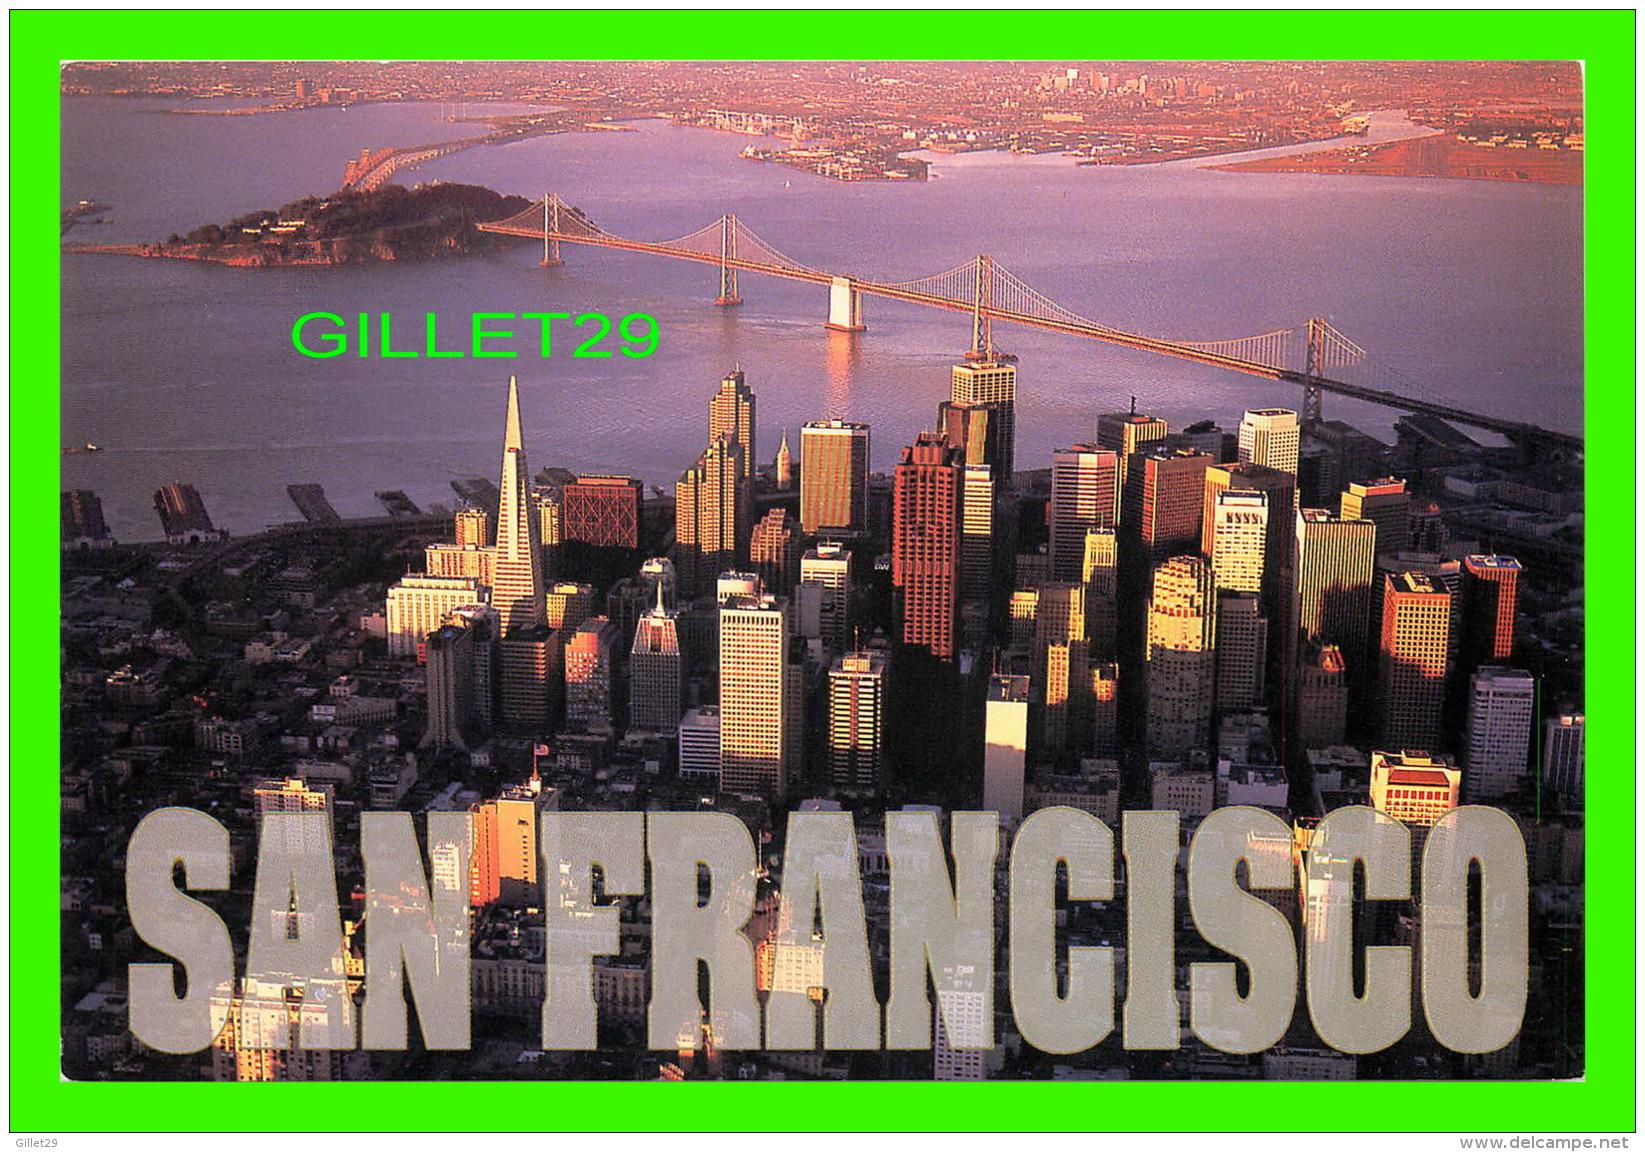 SAN FRANCISCO, CA - AERIAL OF DOWNTOWN SAN FRANCISCO - PHOTO ANDREW McKINNEY - - San Francisco